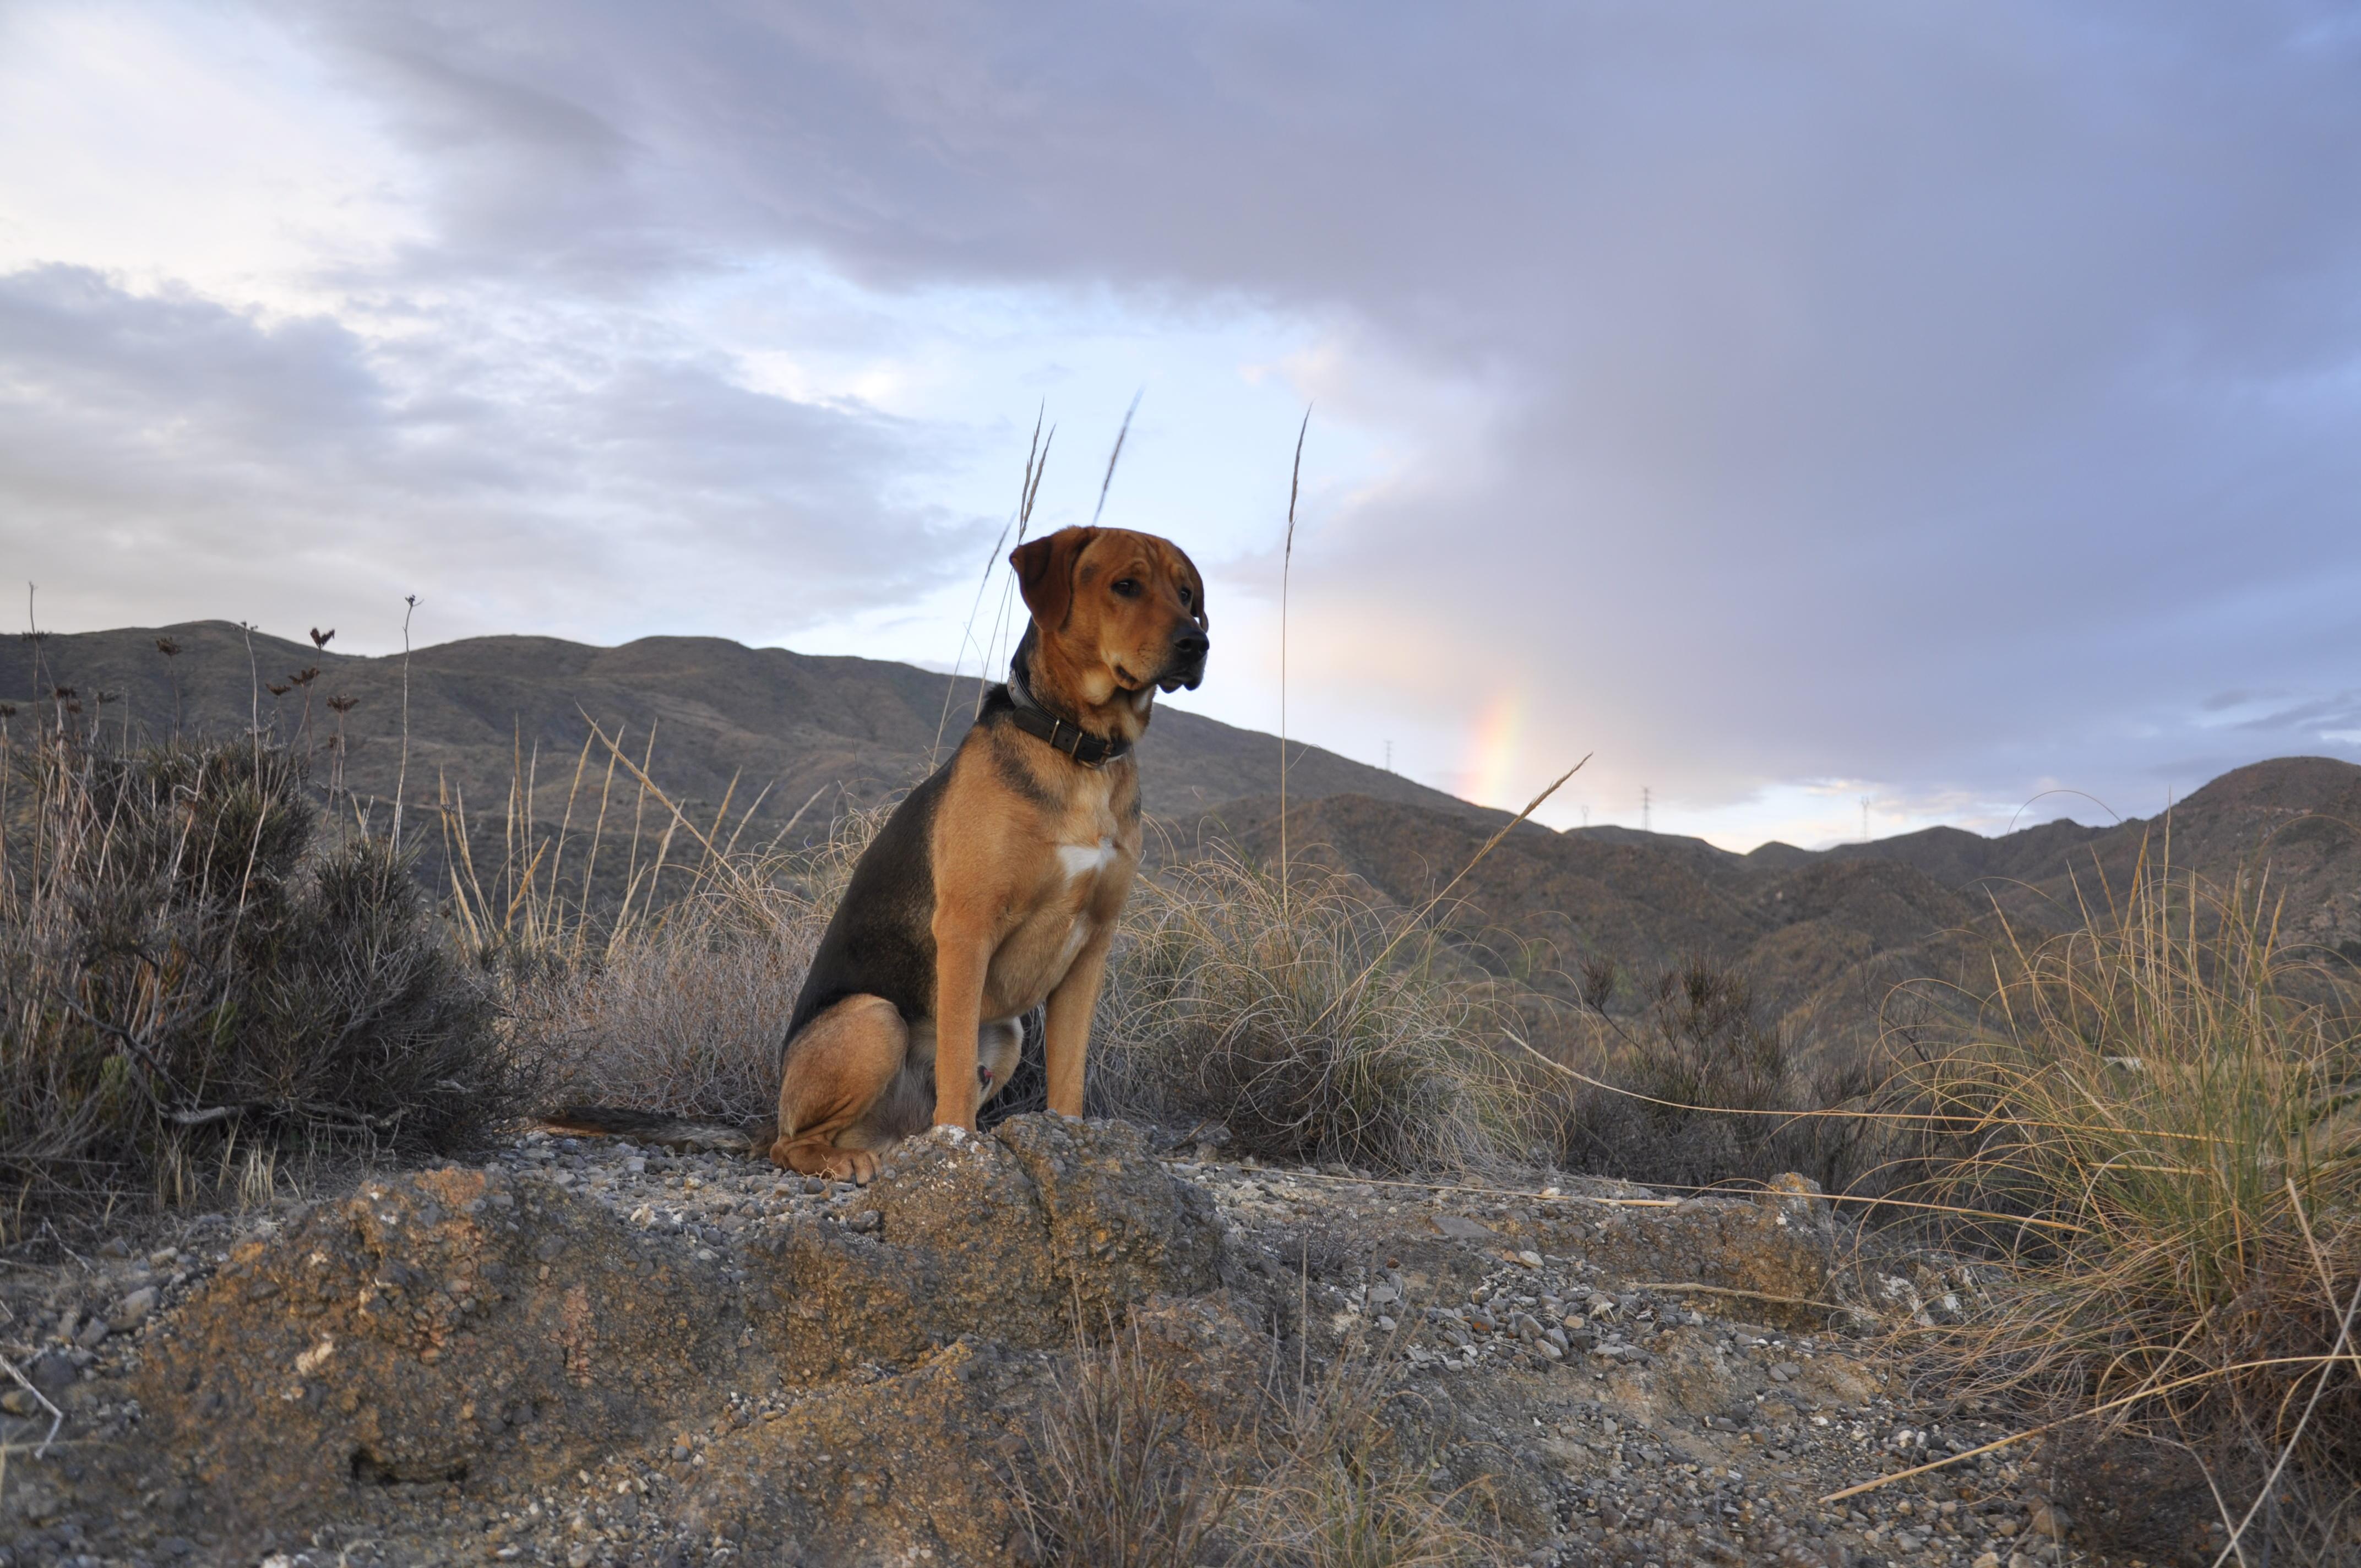 Hund vor schöner Landschaft